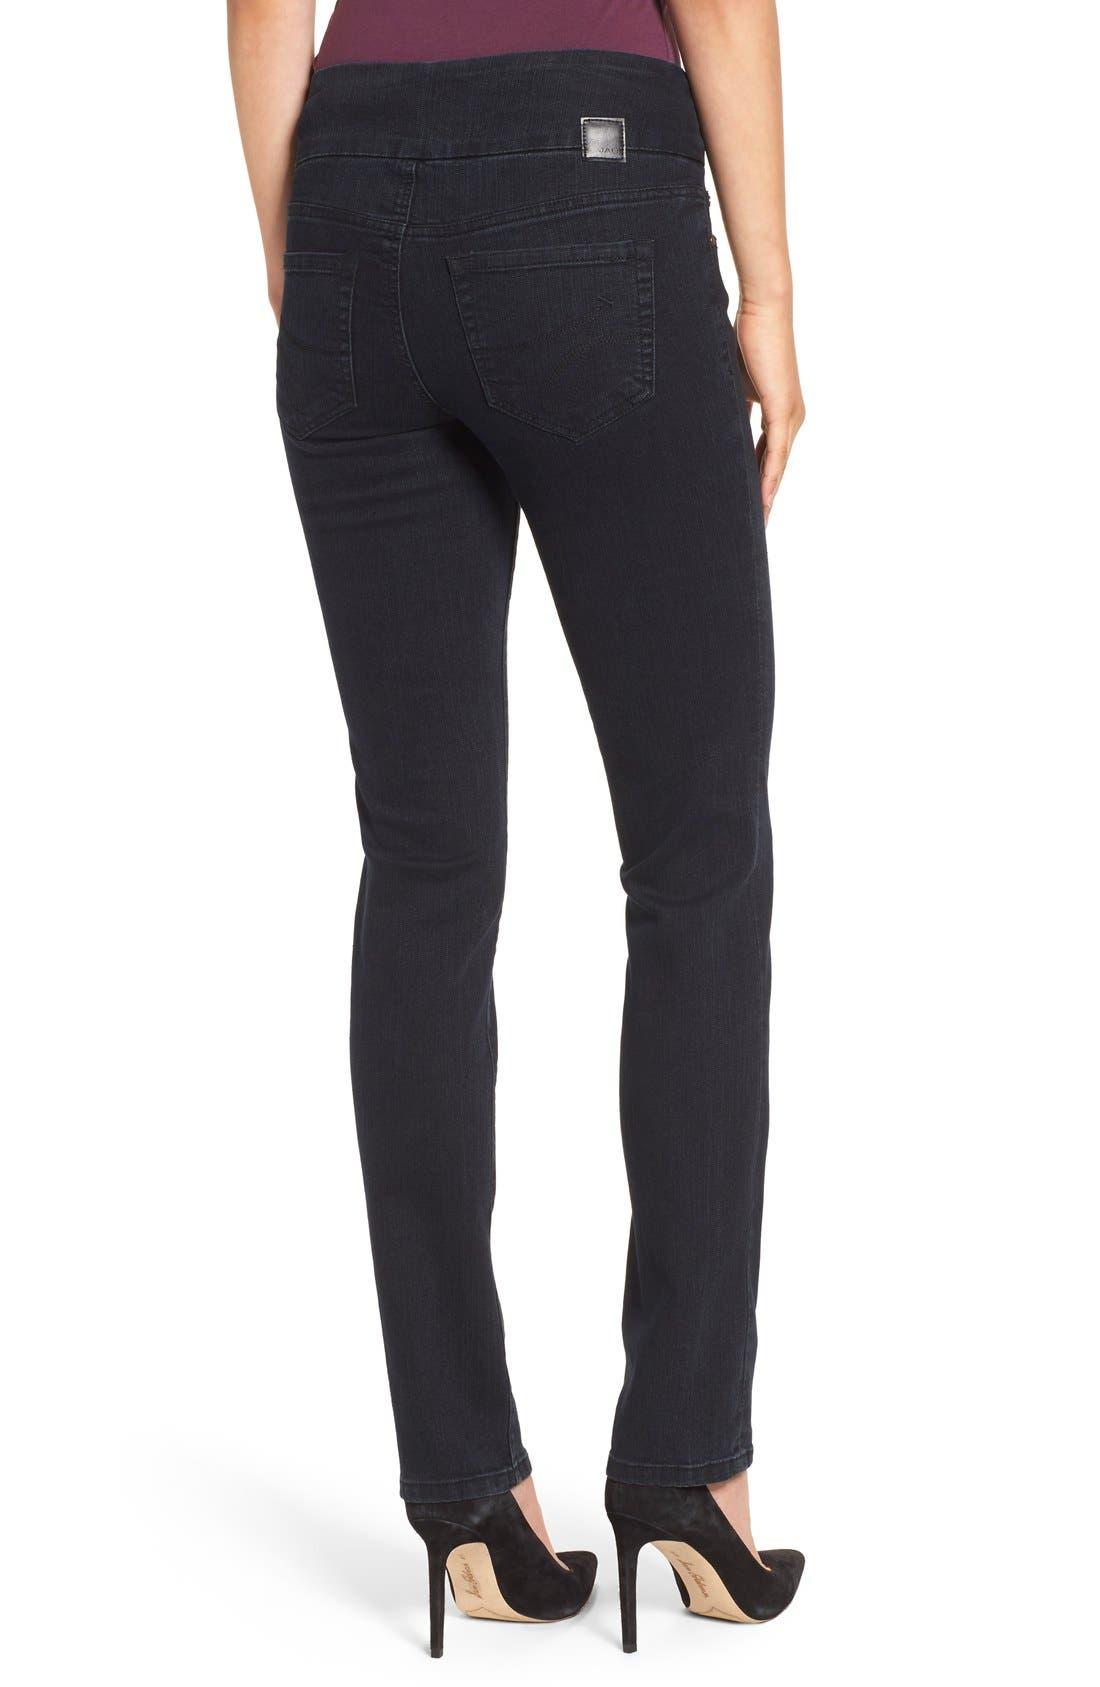 Alternate Image 2  - Jag Jeans 'Peri' Straight Leg Pull-On Jeans (Black Void) (Regular & Petite) (Online Only)